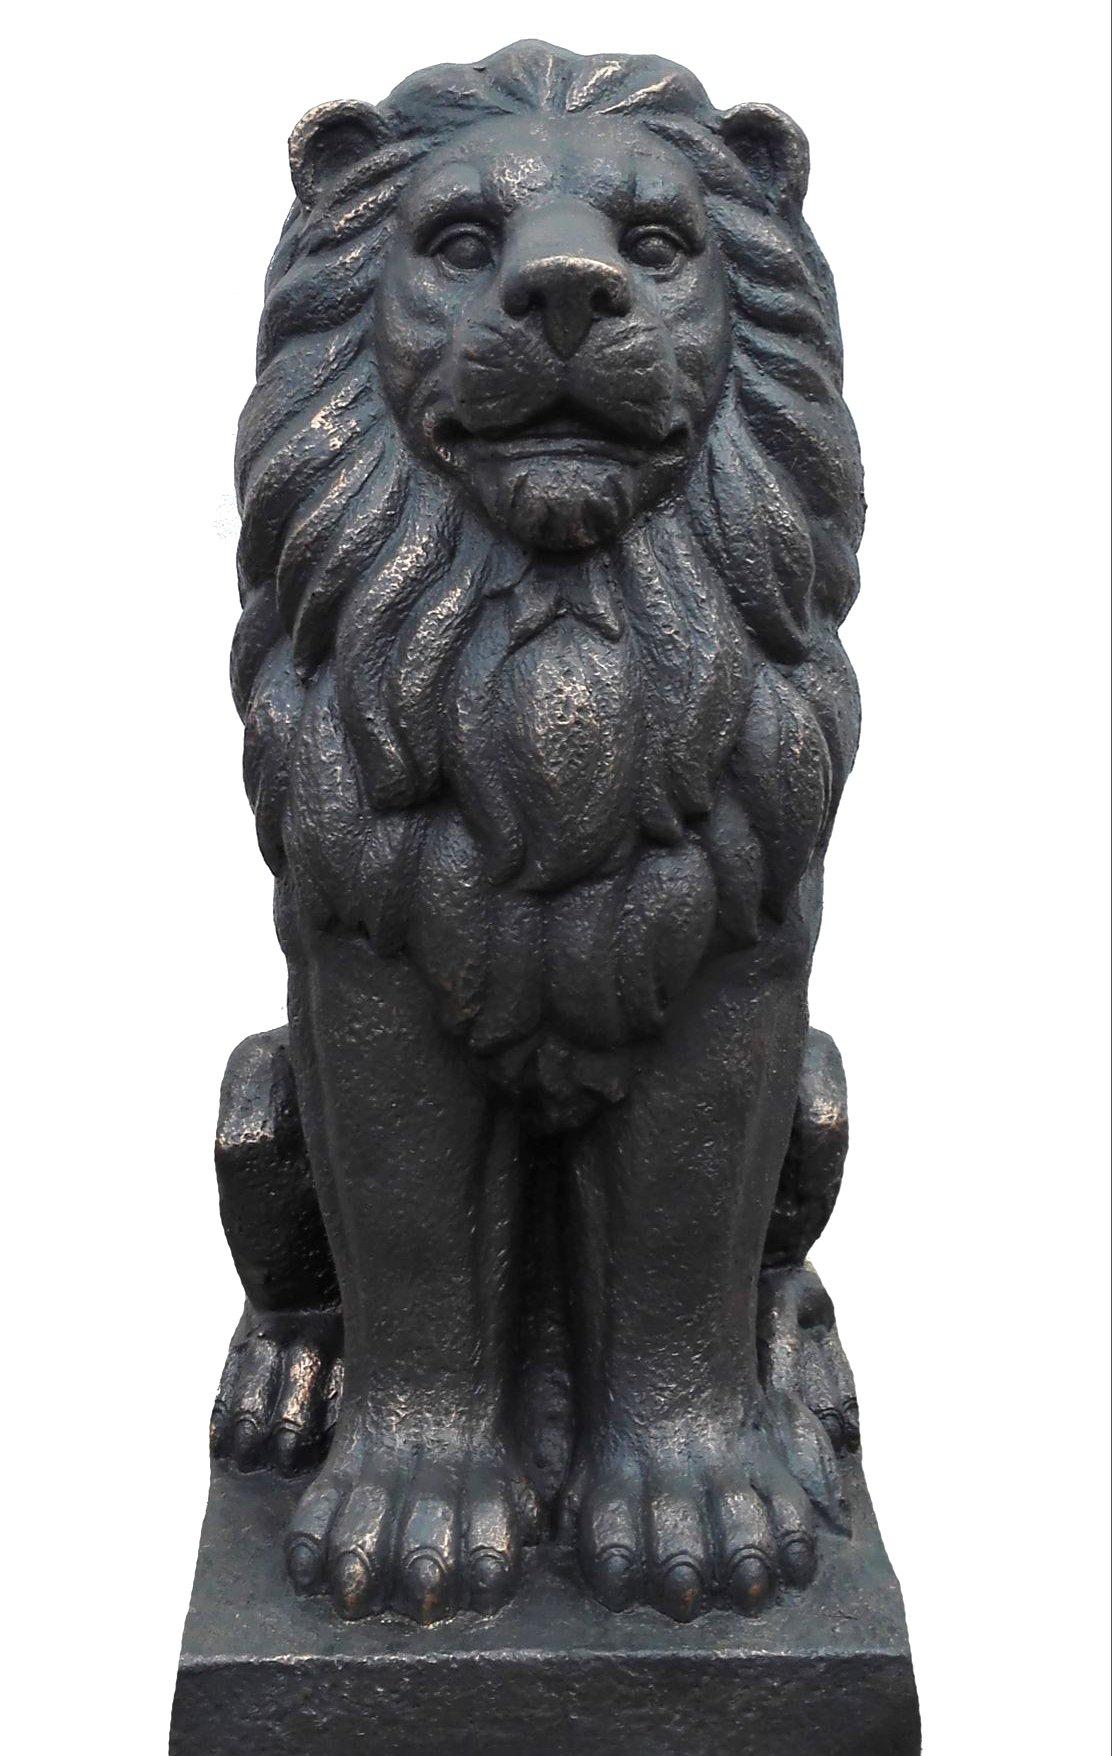 "TIAAN 28"" Lion King Concrete Statues Garden Statue Decor Lion Sculptures Outdoor Indoor Ornament Home Patio Large Figurines by TIAAN (Image #5)"